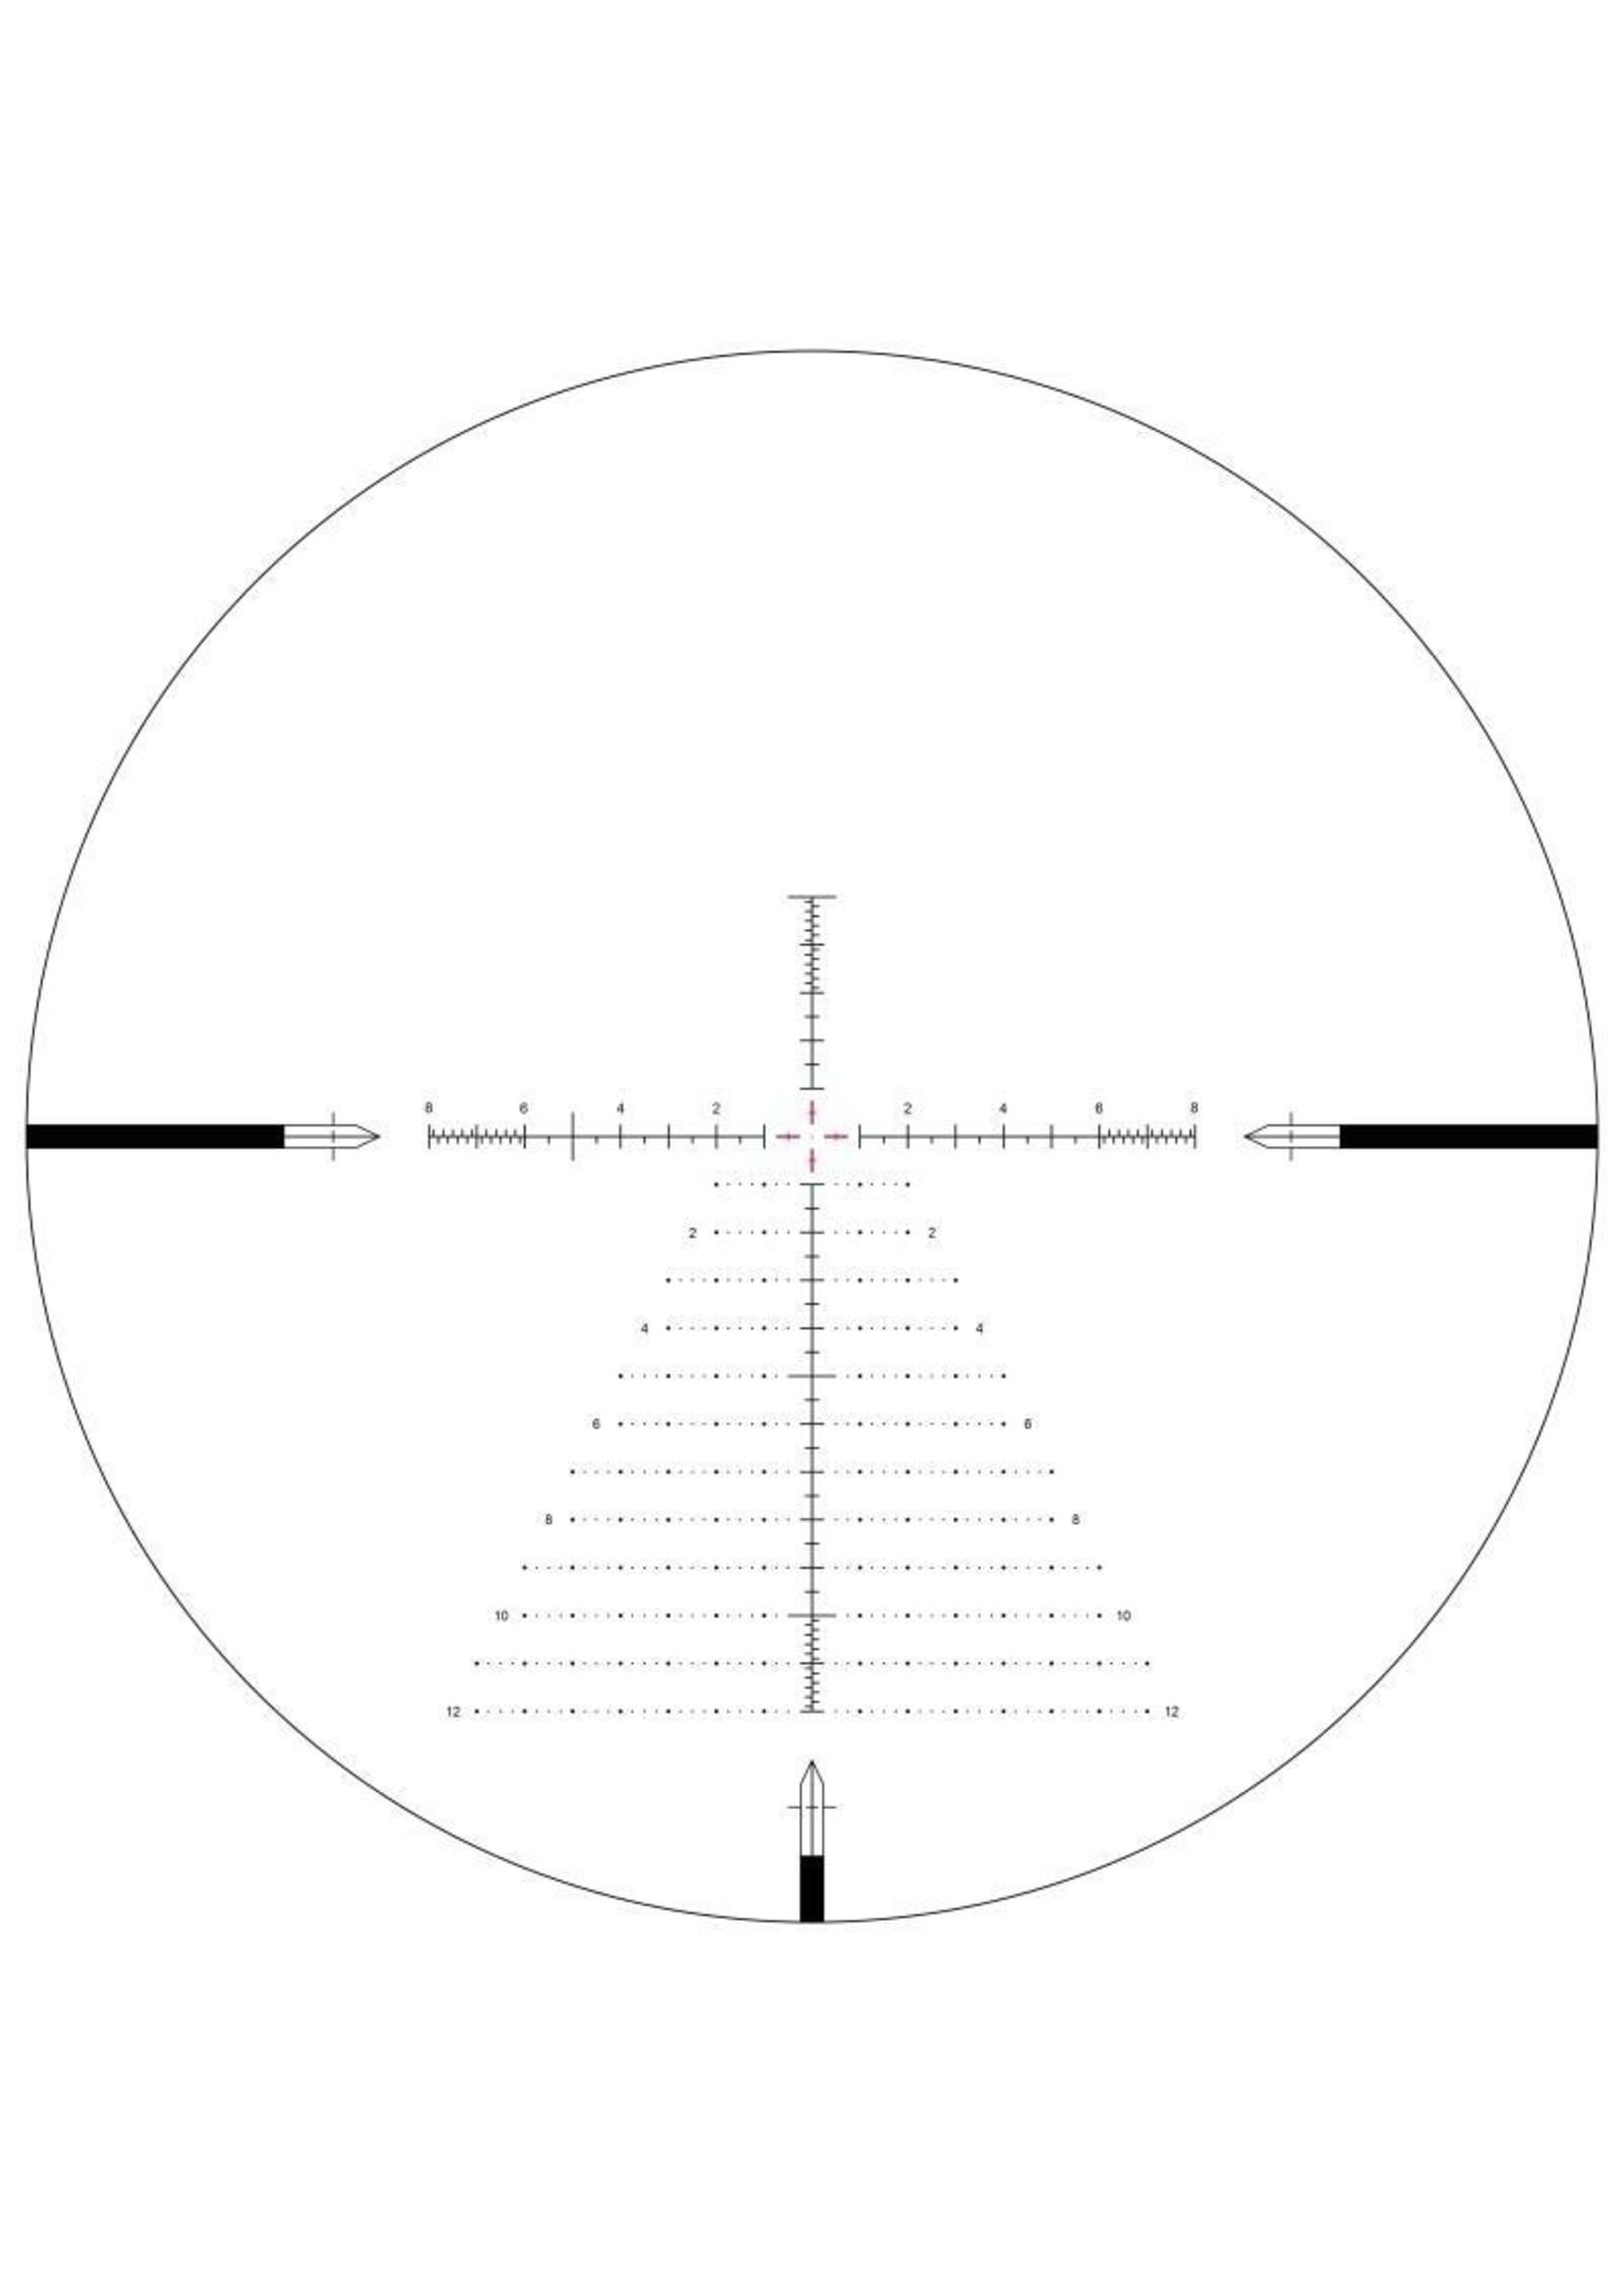 Arken Arken Optics USA SH4 6-24X50 GEN2 FFP MIL VPR Illuminated Reticle with Zero Stop - 34mm Tube